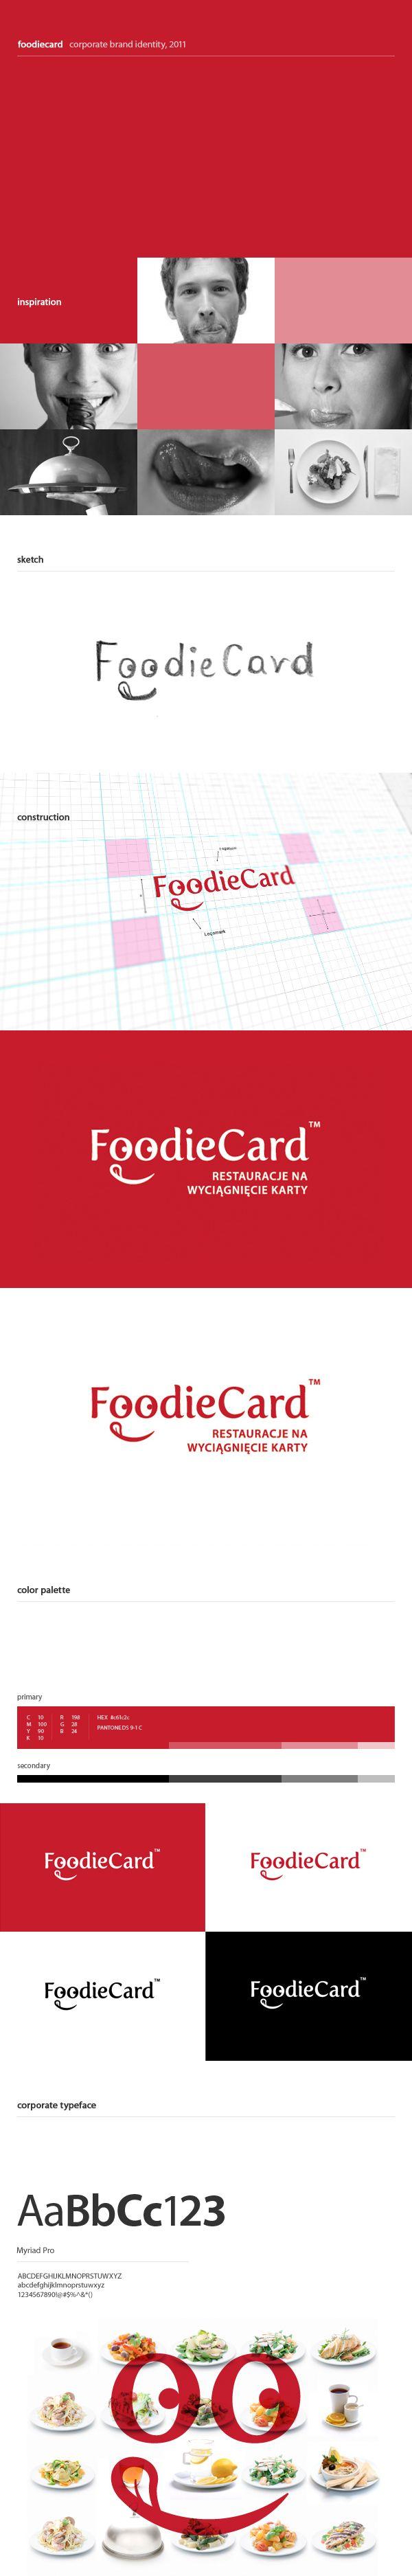 Logo design process for foodiecard.pl